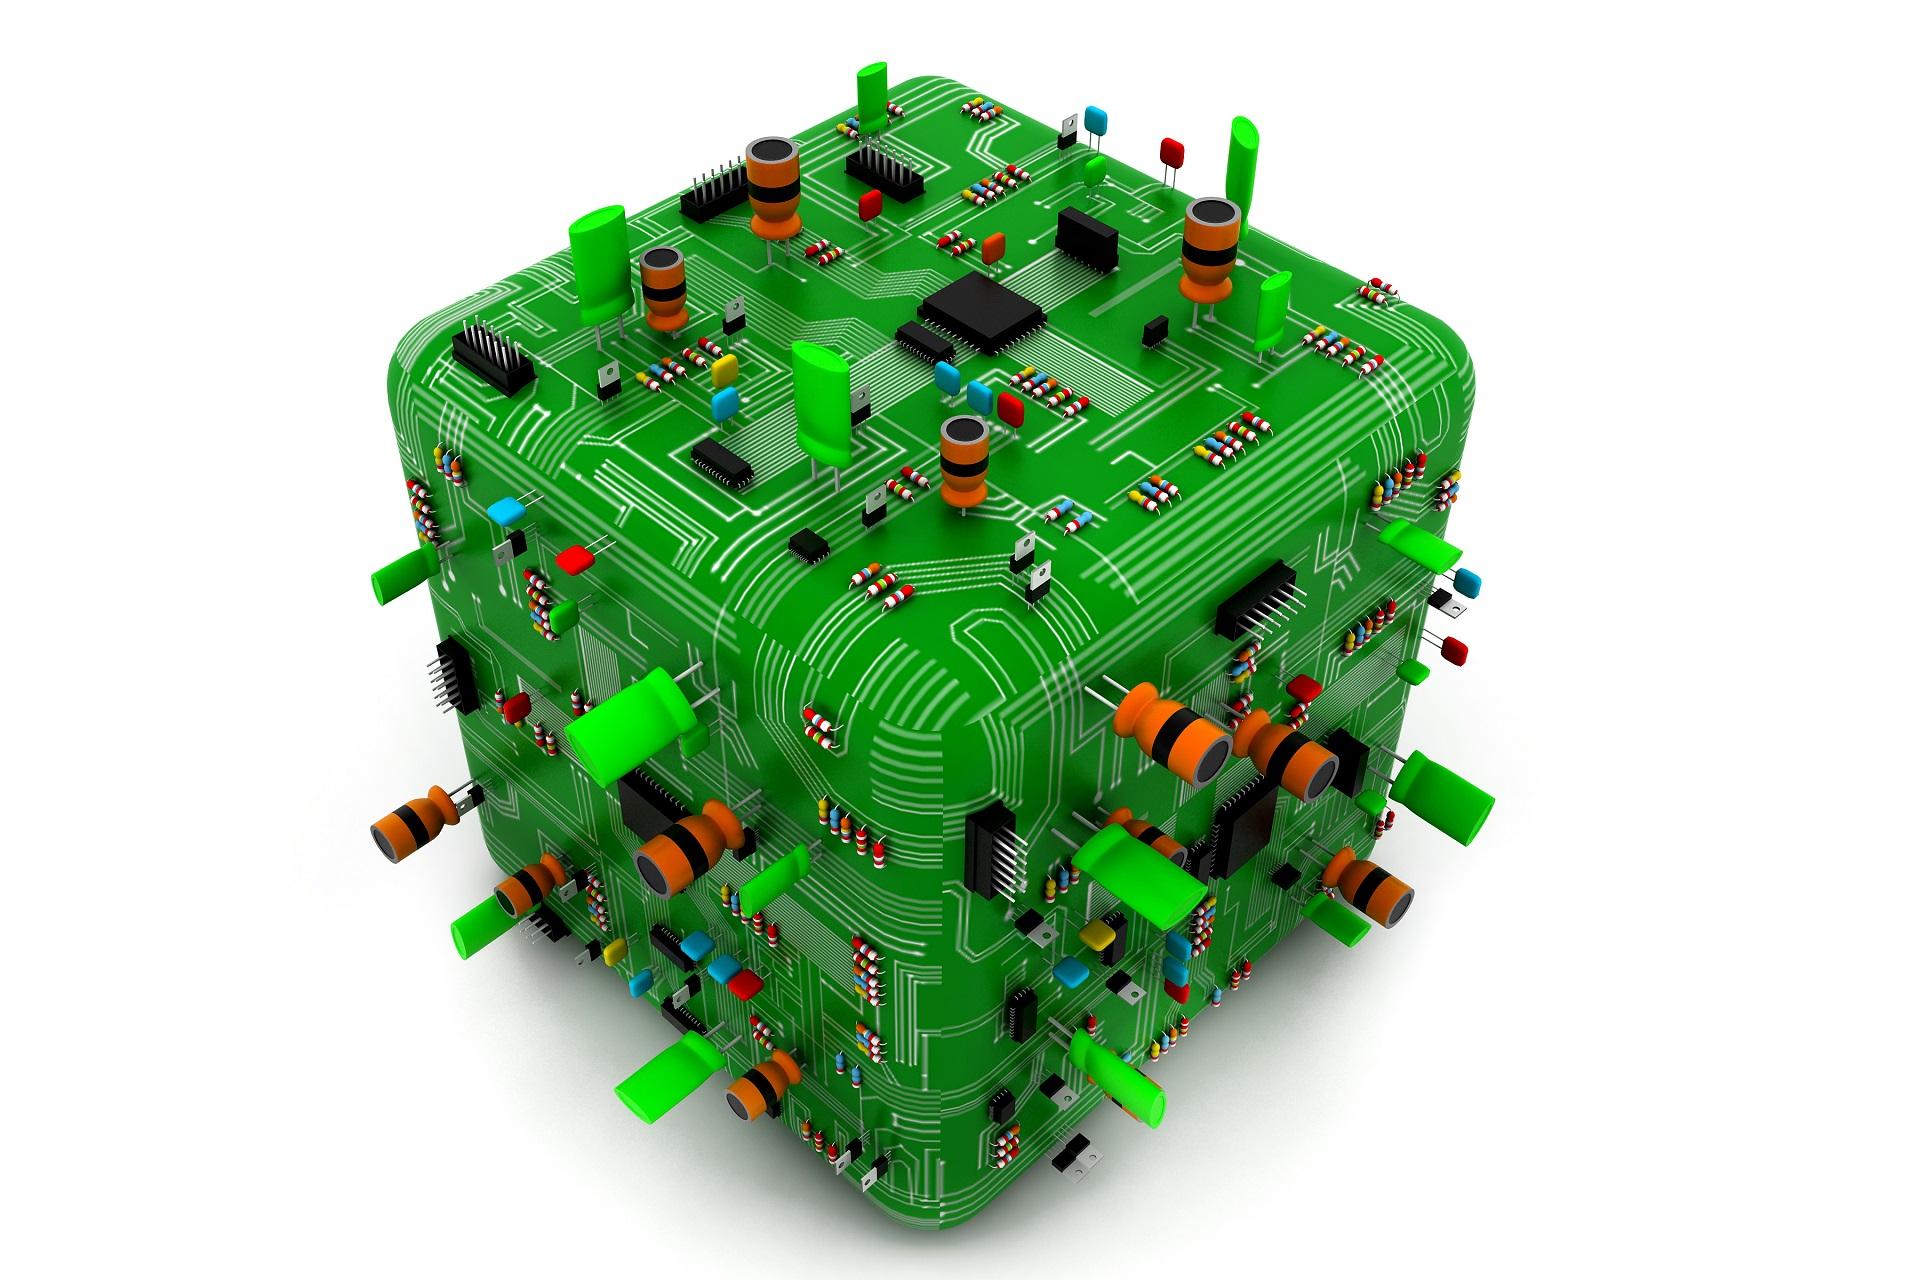 Cubed Circuit Board